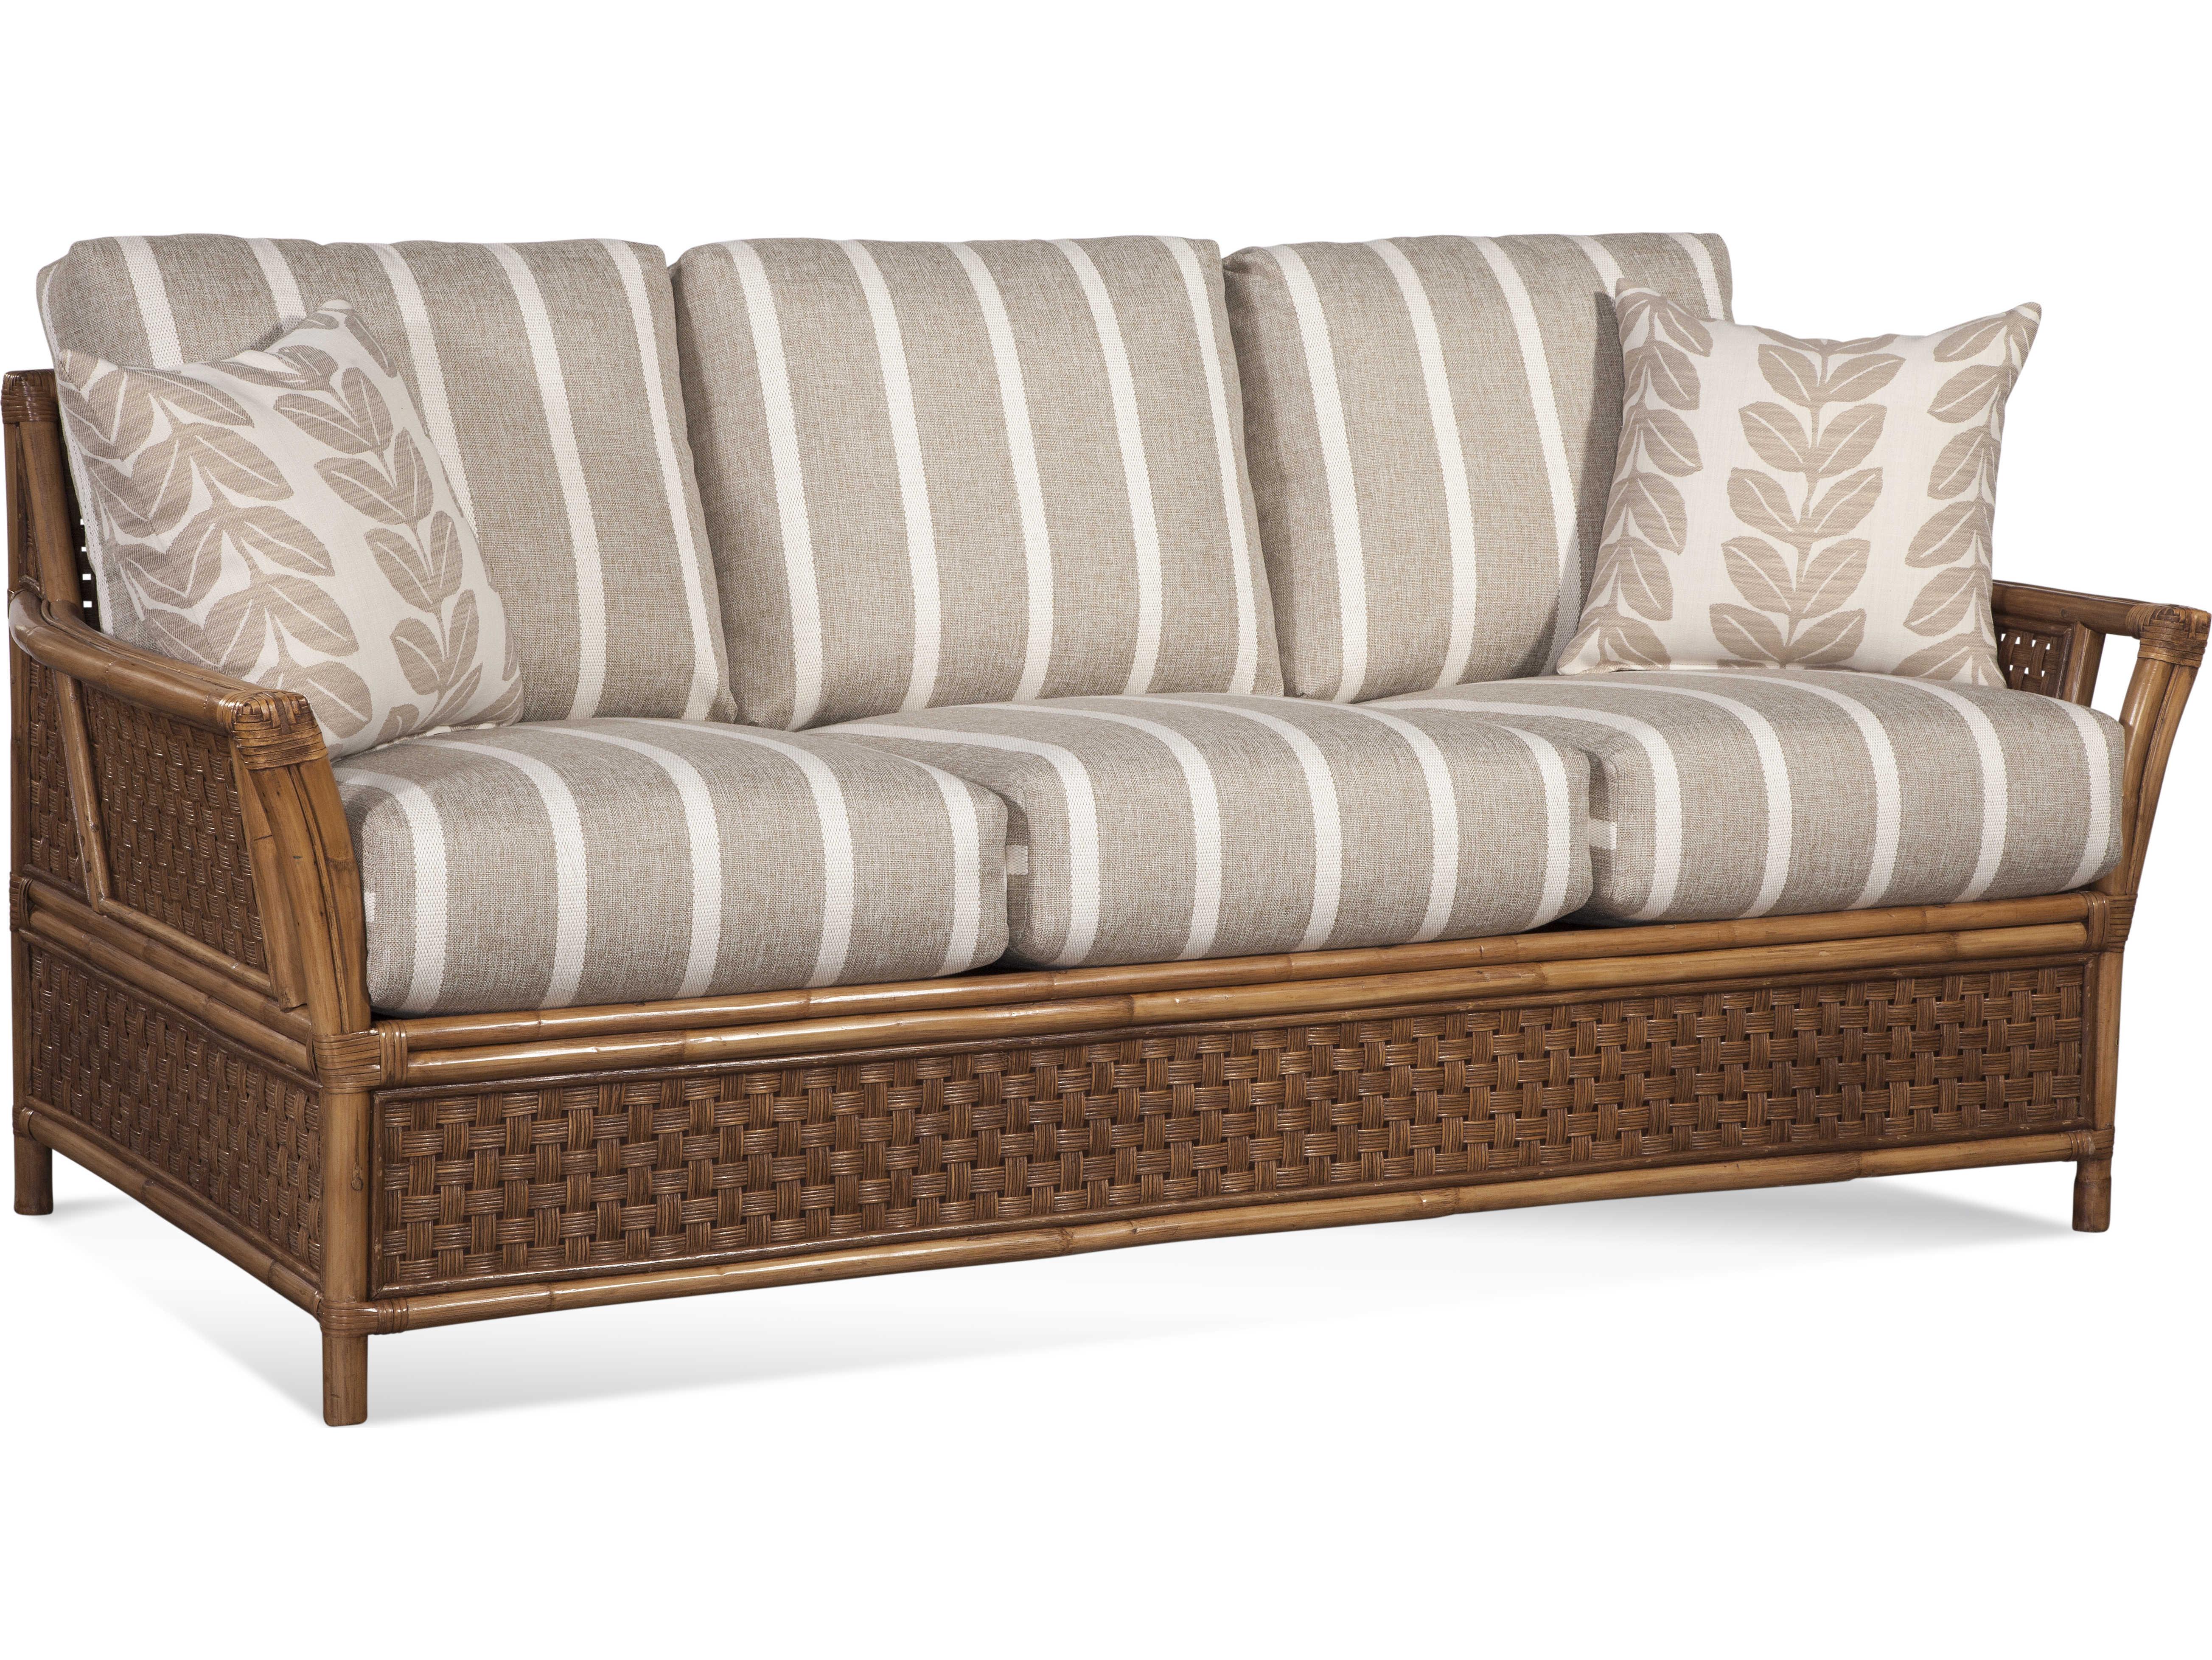 Braxton Culler Boca Sofa Bed Bxc973015